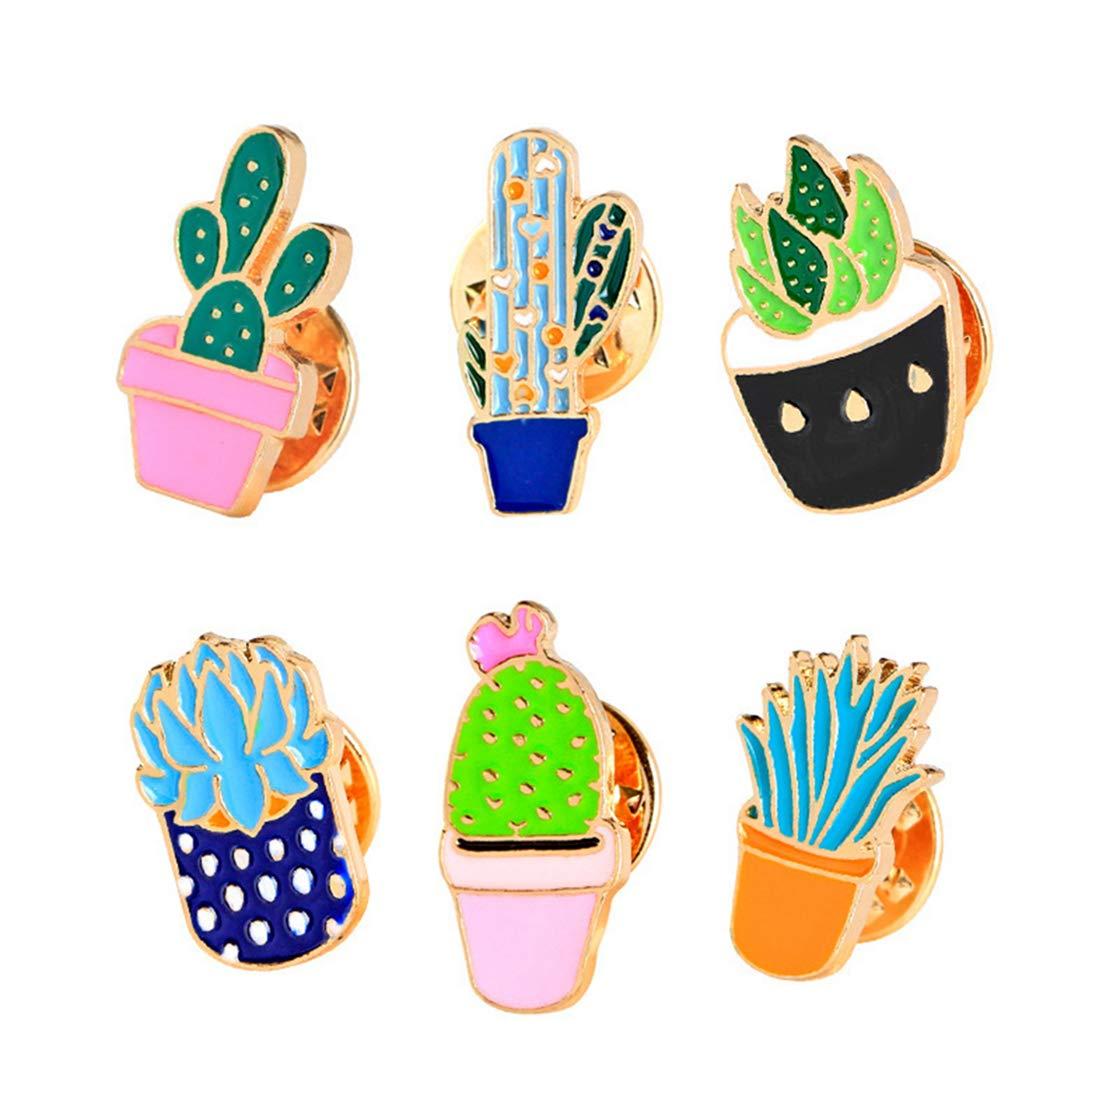 Ever Fairy Cute Enamel Lapel Pin Set-Cartoon Animal Brooch Pins Brooch Pin  Badges for Clothes Bags Backpacks for Women Girls Teen Children Kawaii